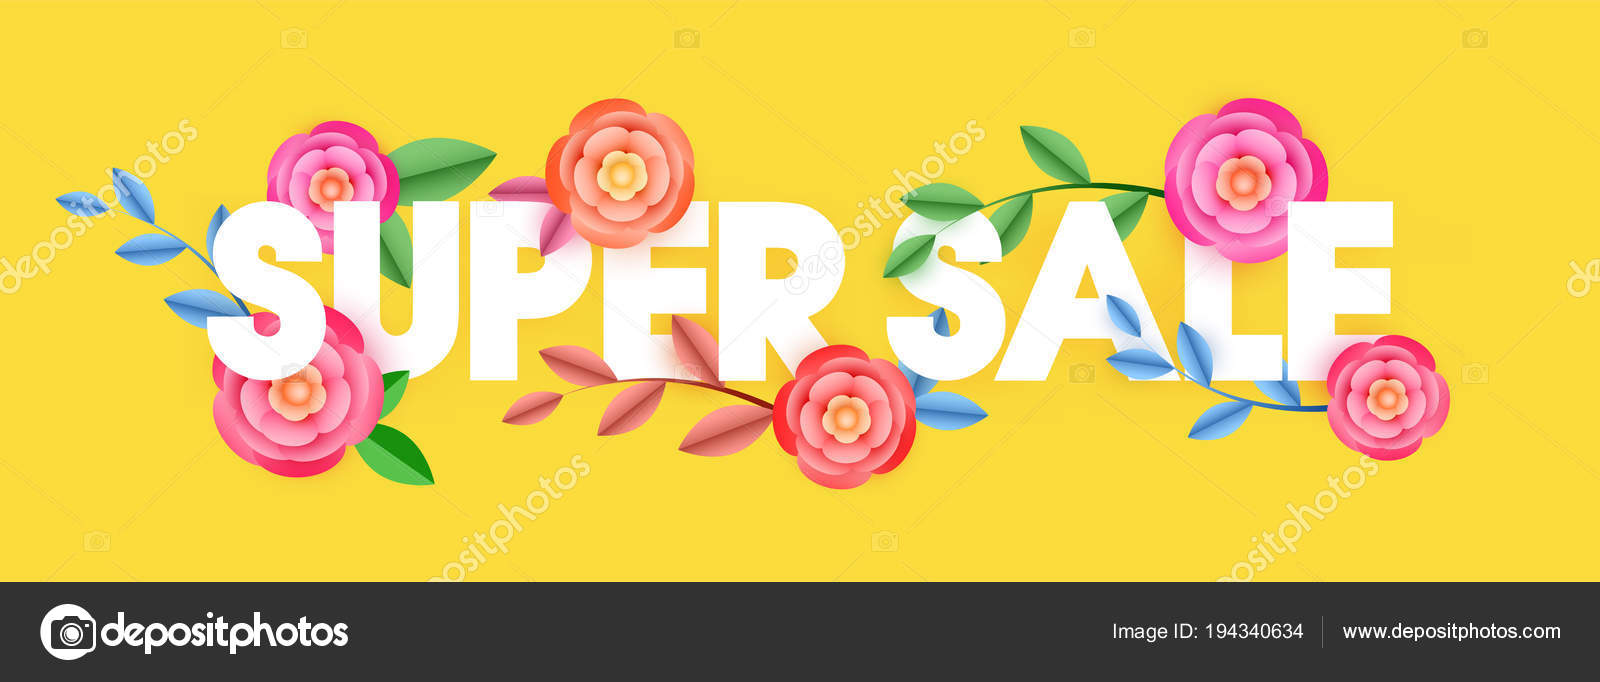 Stylish Text Super Sale Decorated Beautiful Flowers Yellow